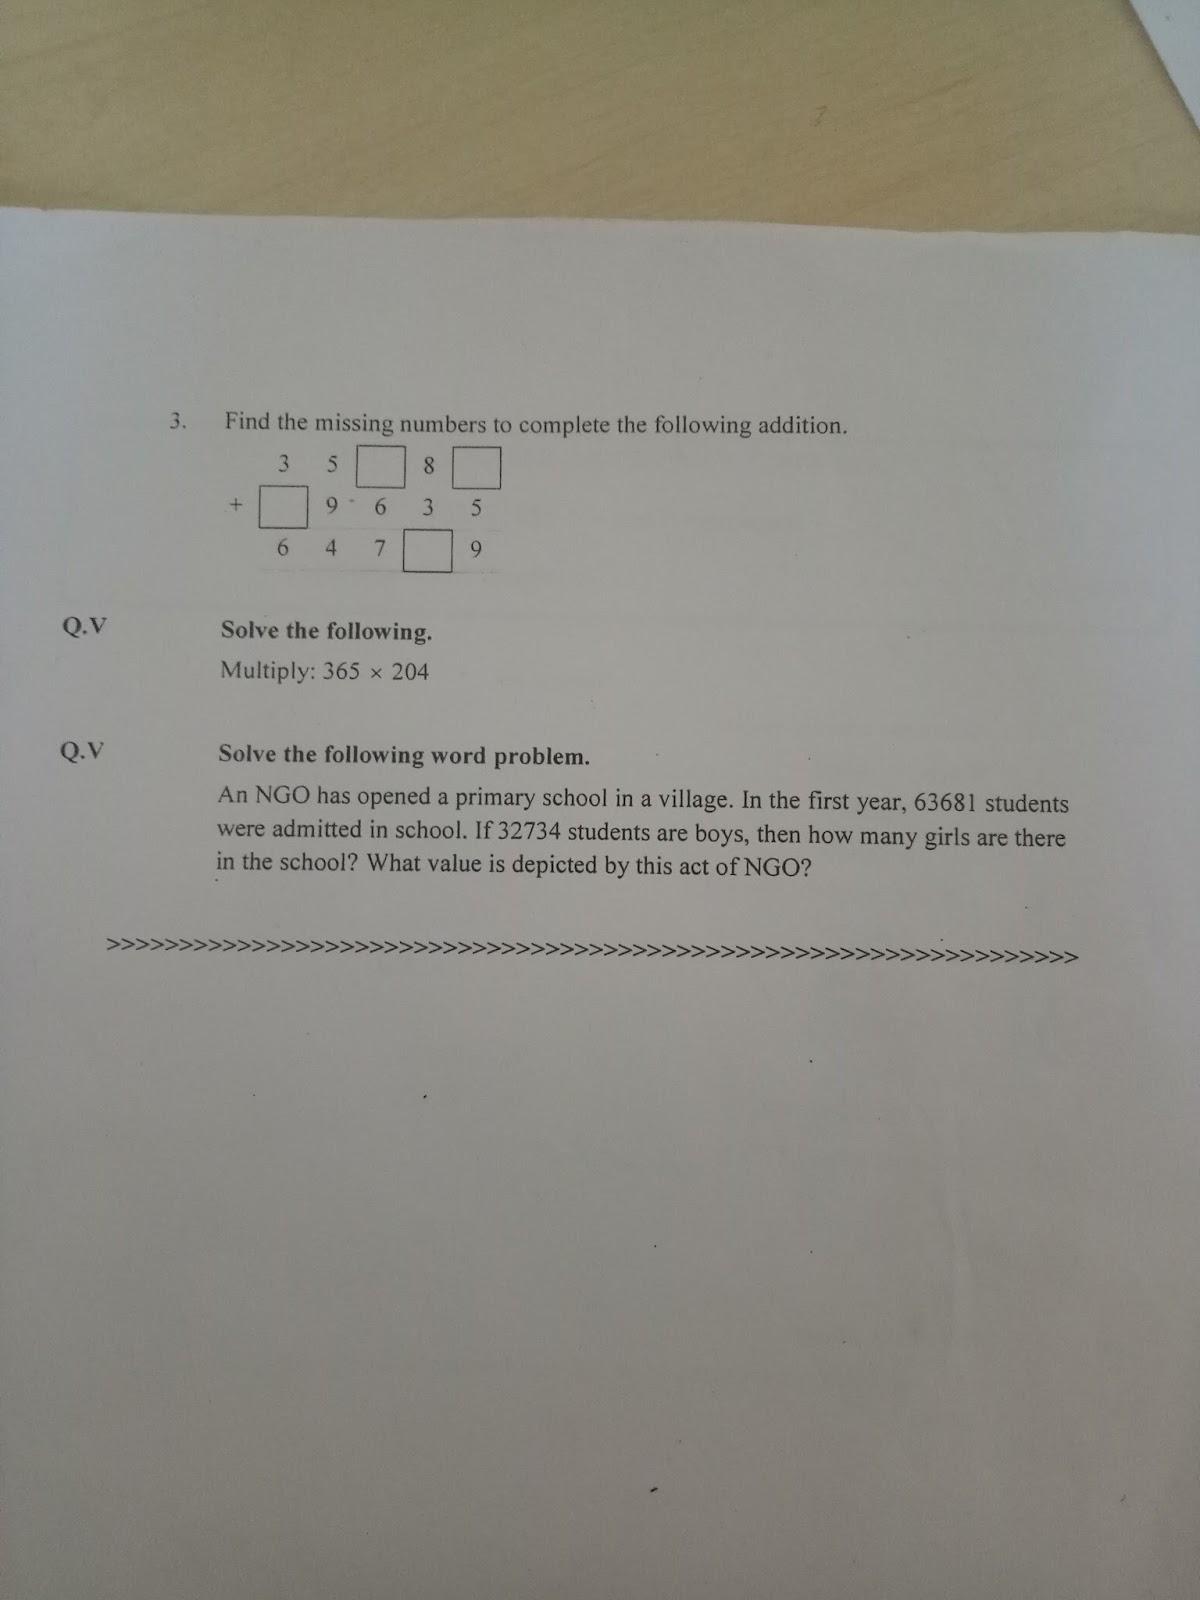 Pis Vadodara Std 4 Grade 4 Math Revision Worksheet